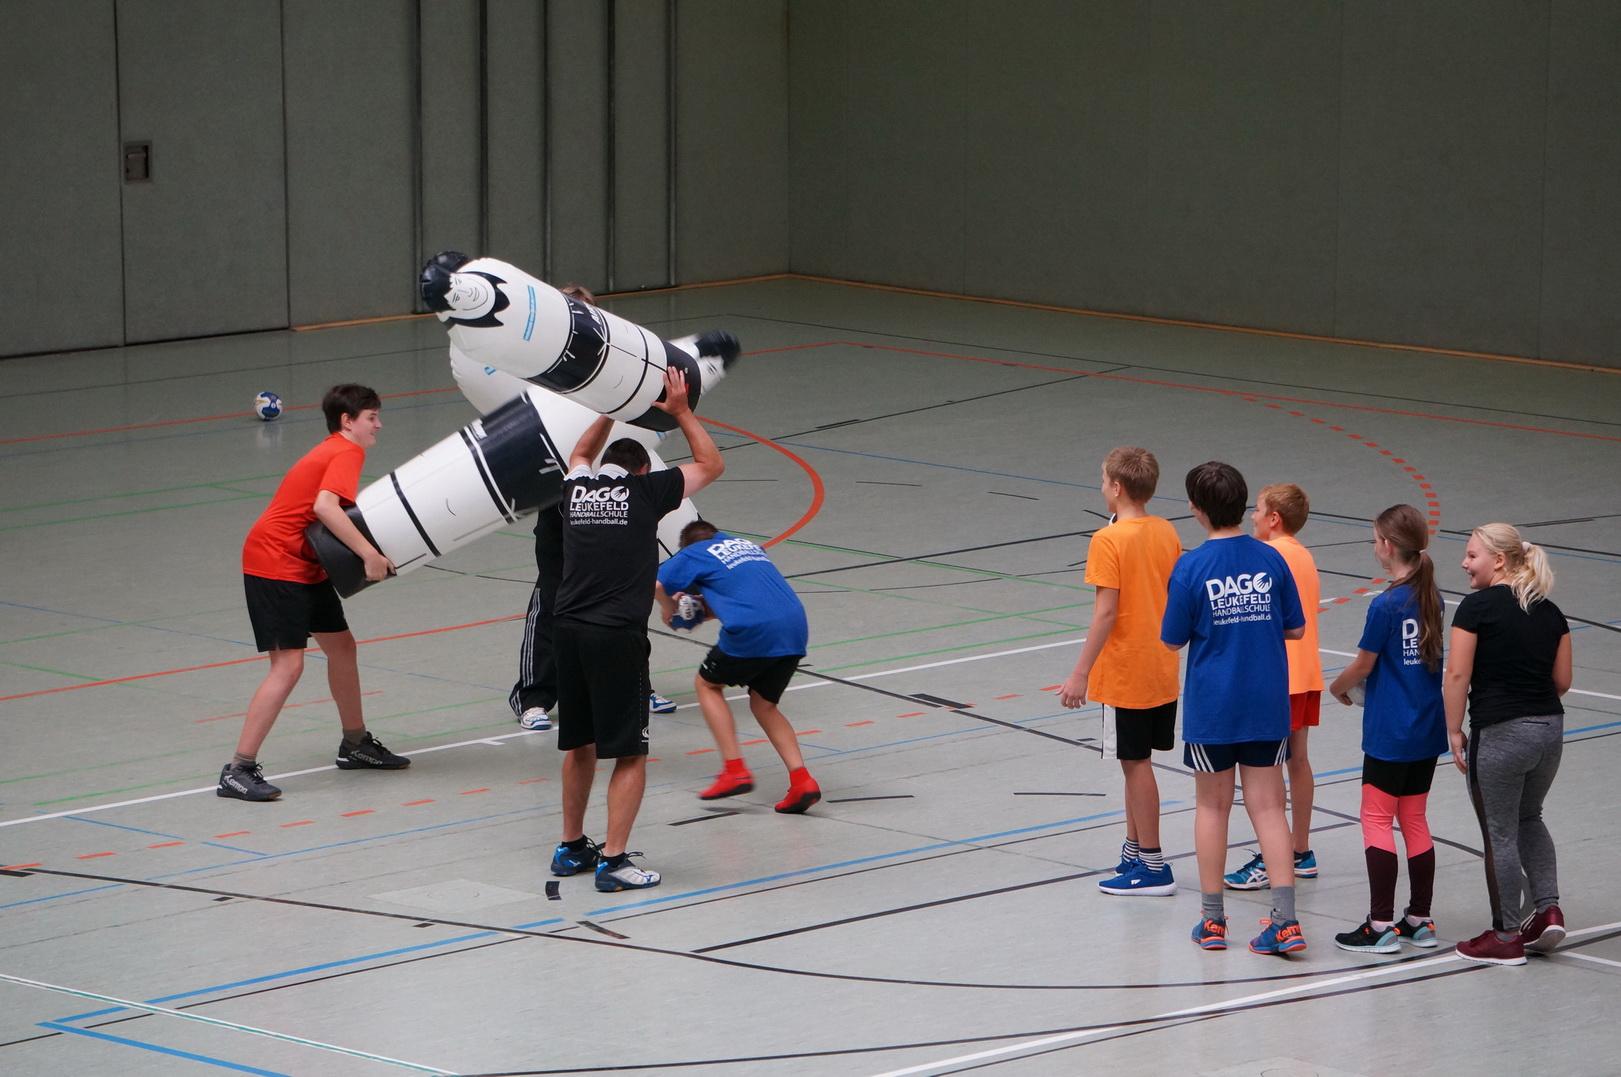 201808_Handballcamp_SDH_MG_259w